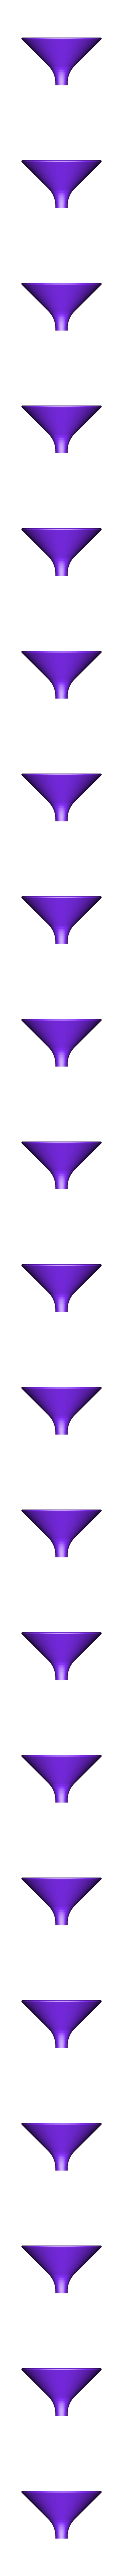 Hairspray_Pump.stl Download free STL file Hairspray Pump • 3D printing object, derailed